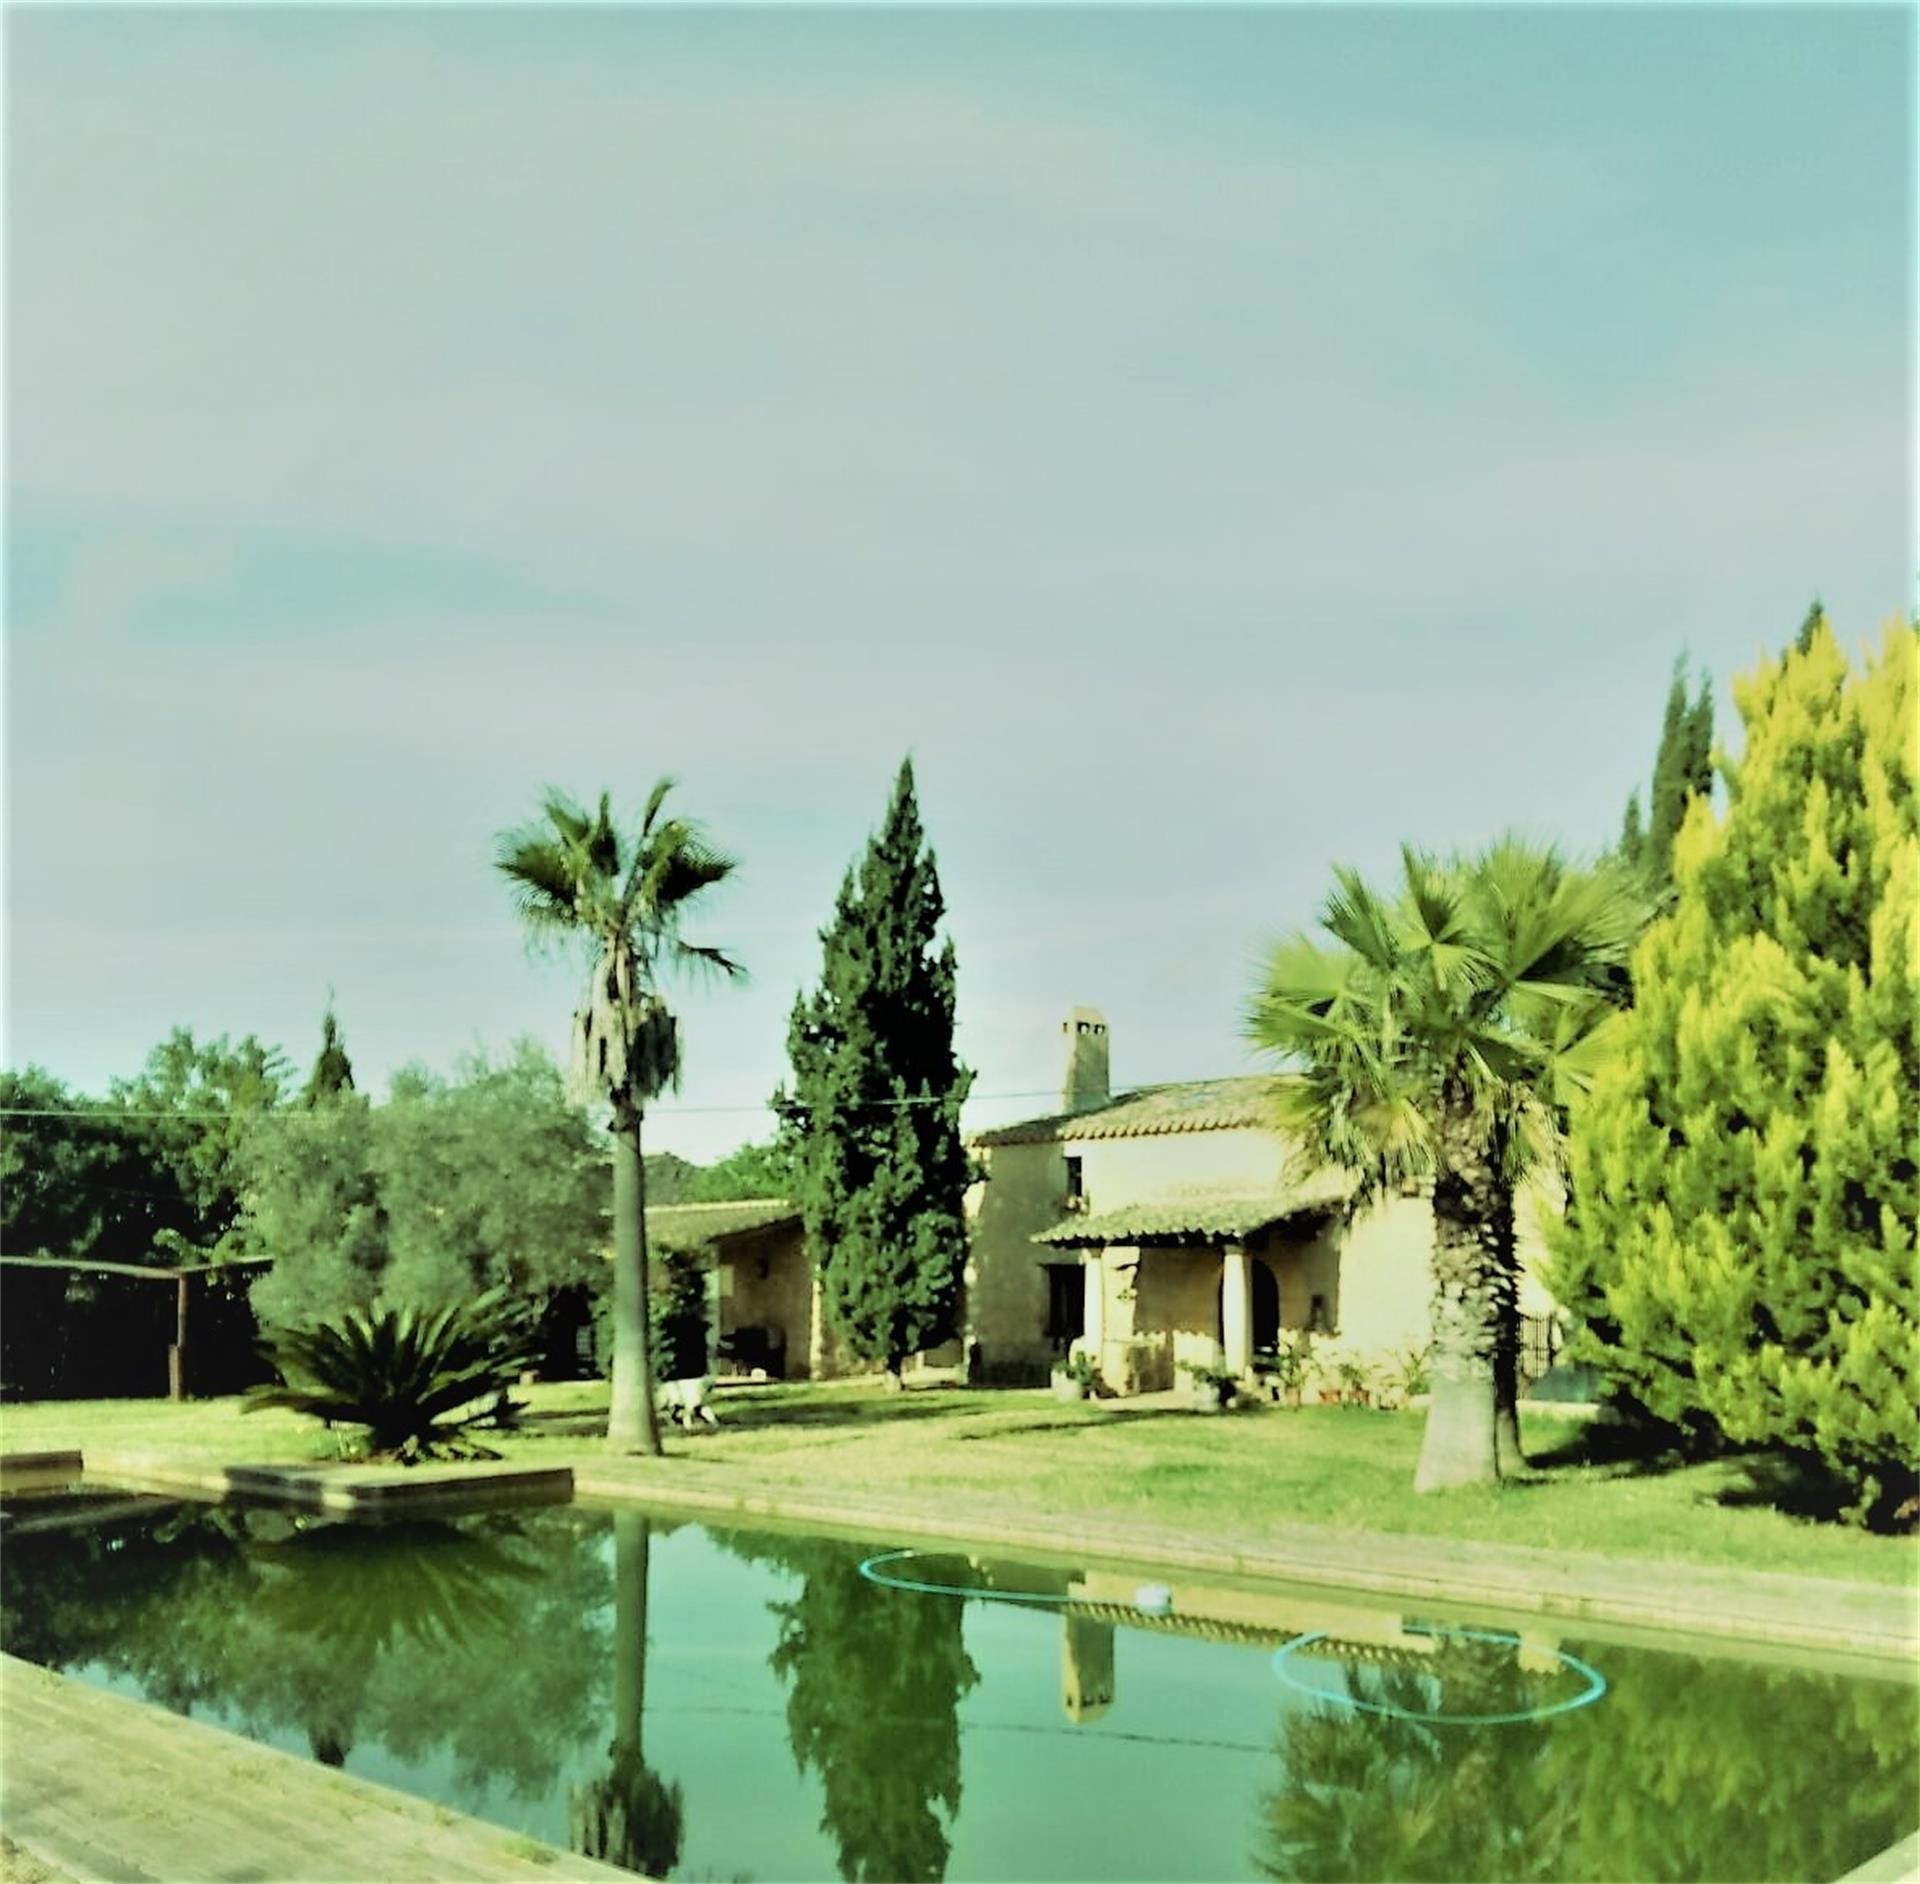 Casa en Sencelles. Sencelles